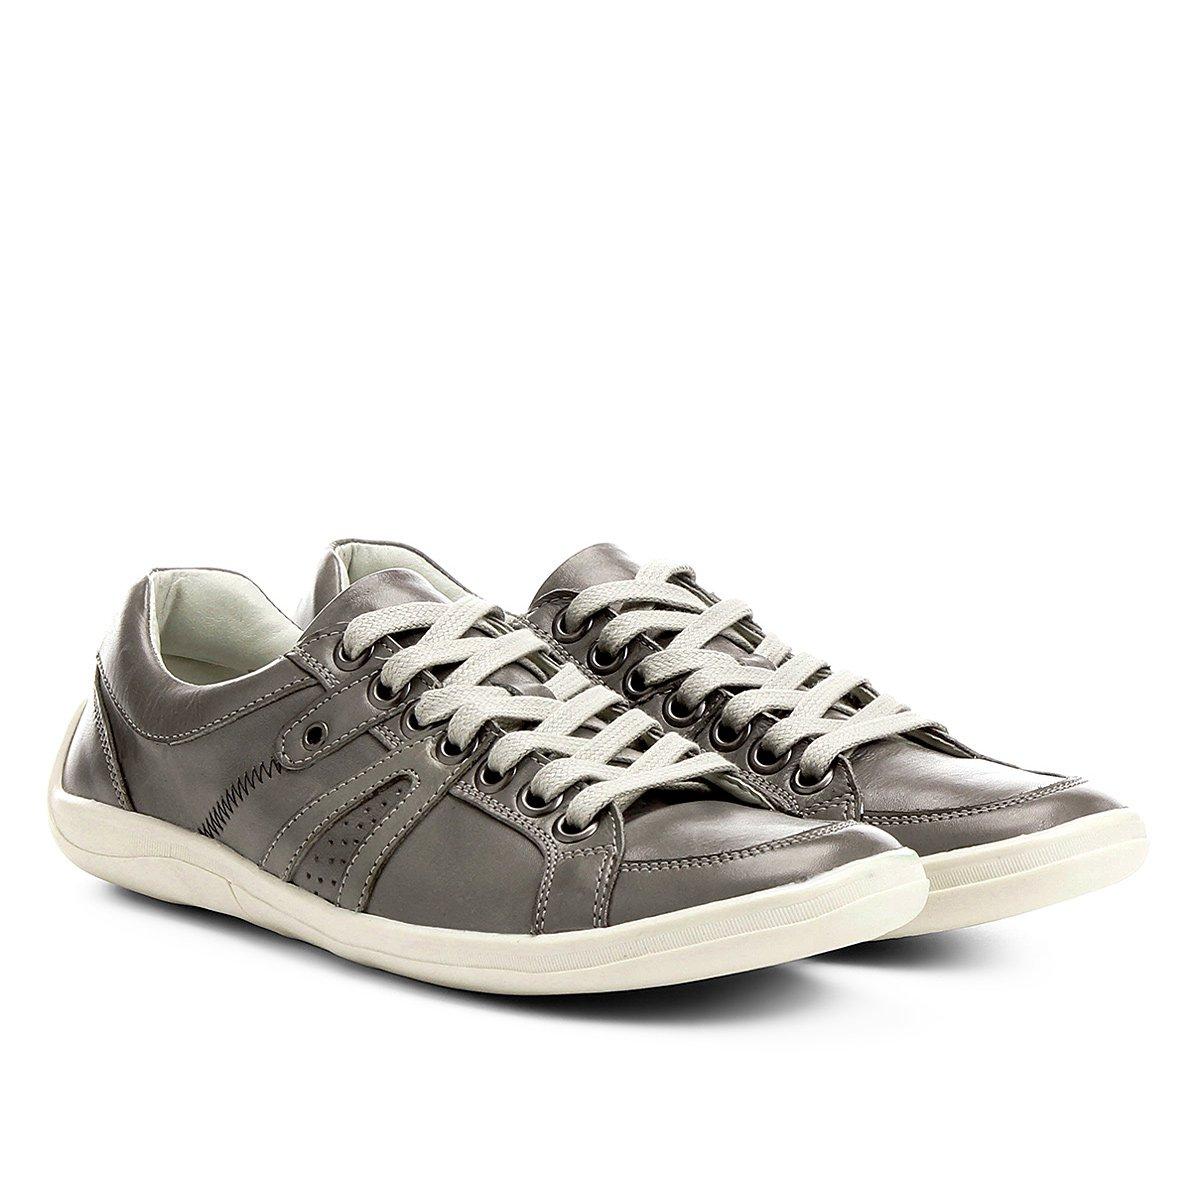 bd5c23d60f Sapatênis Couro Shoestock Ilhós Masculino